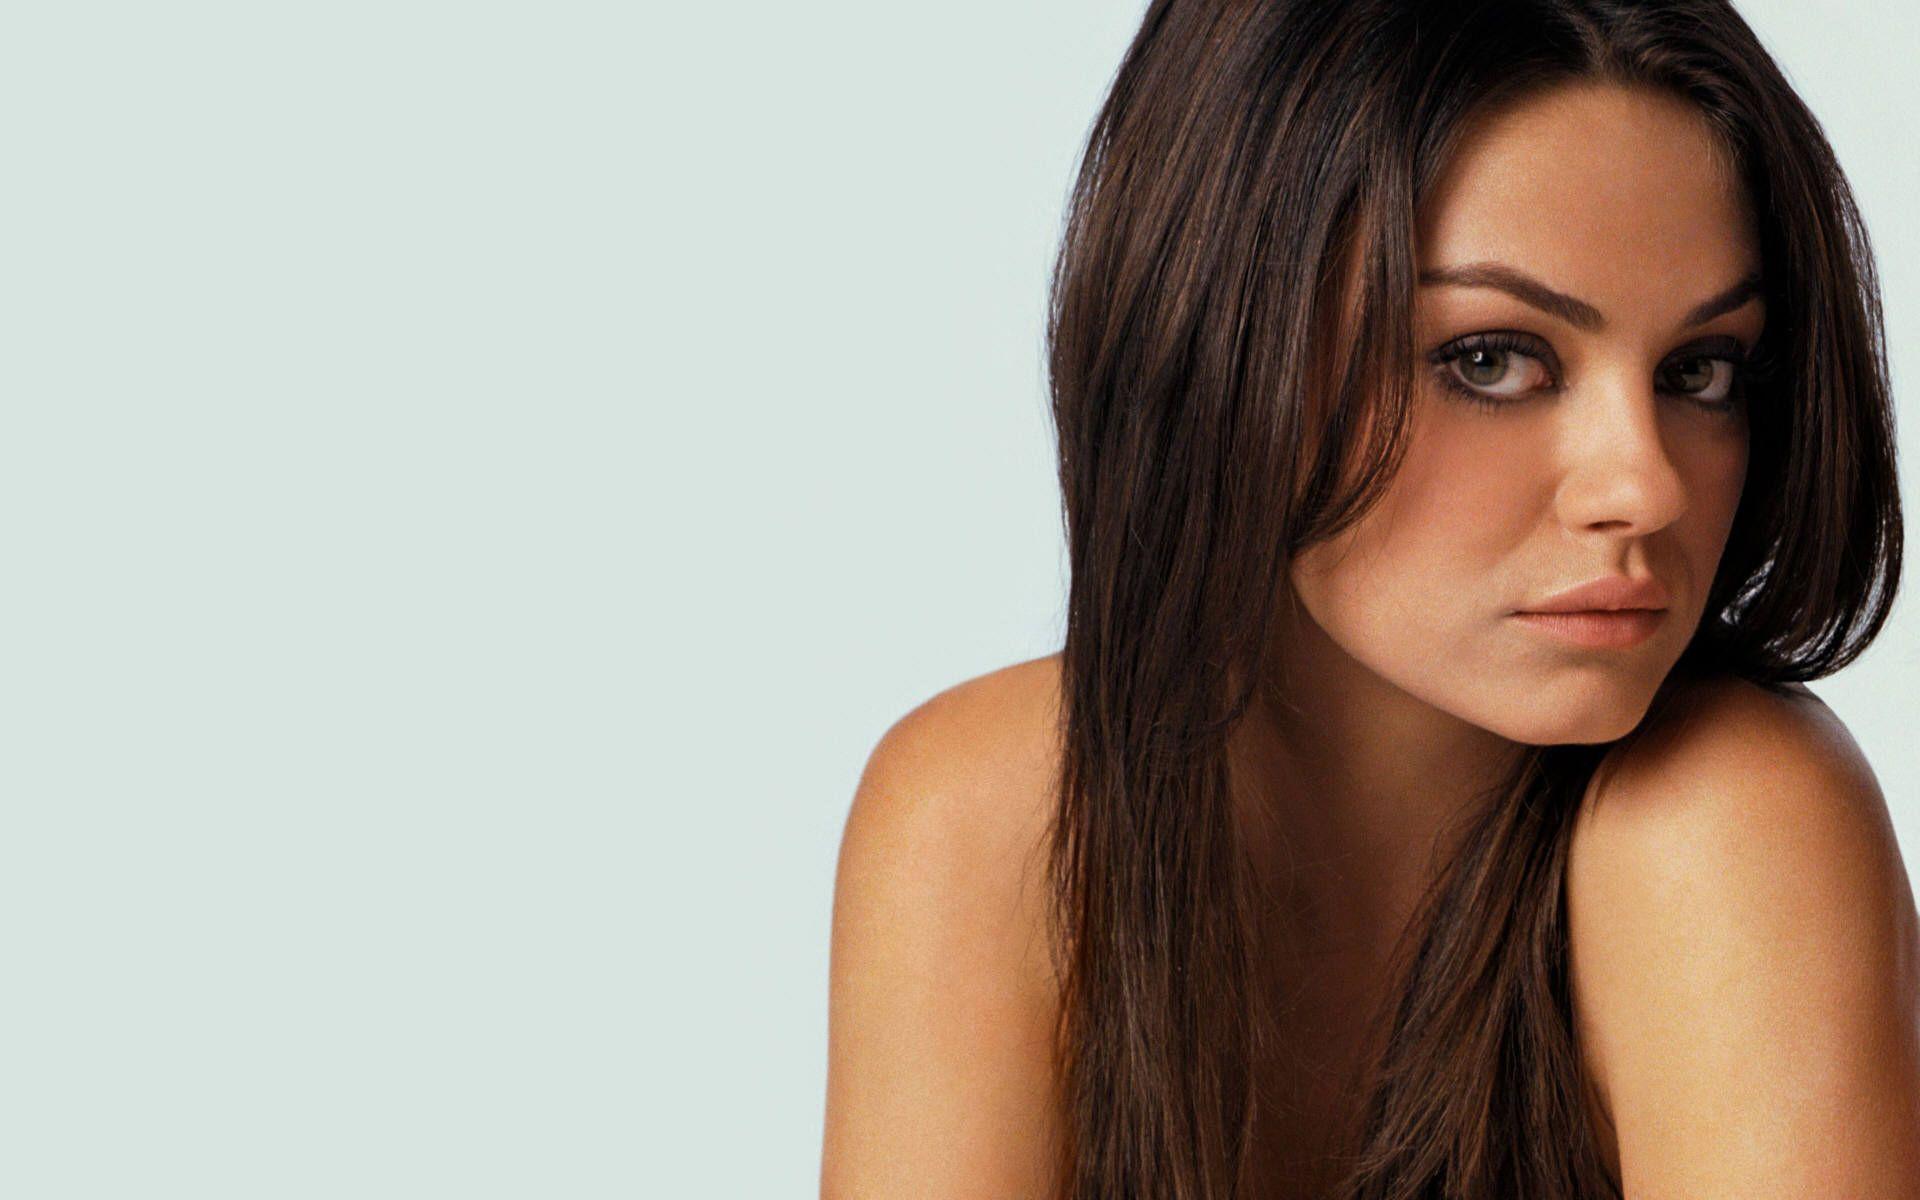 Mila Kunis Wallpapers - HD Wallpapers Inn